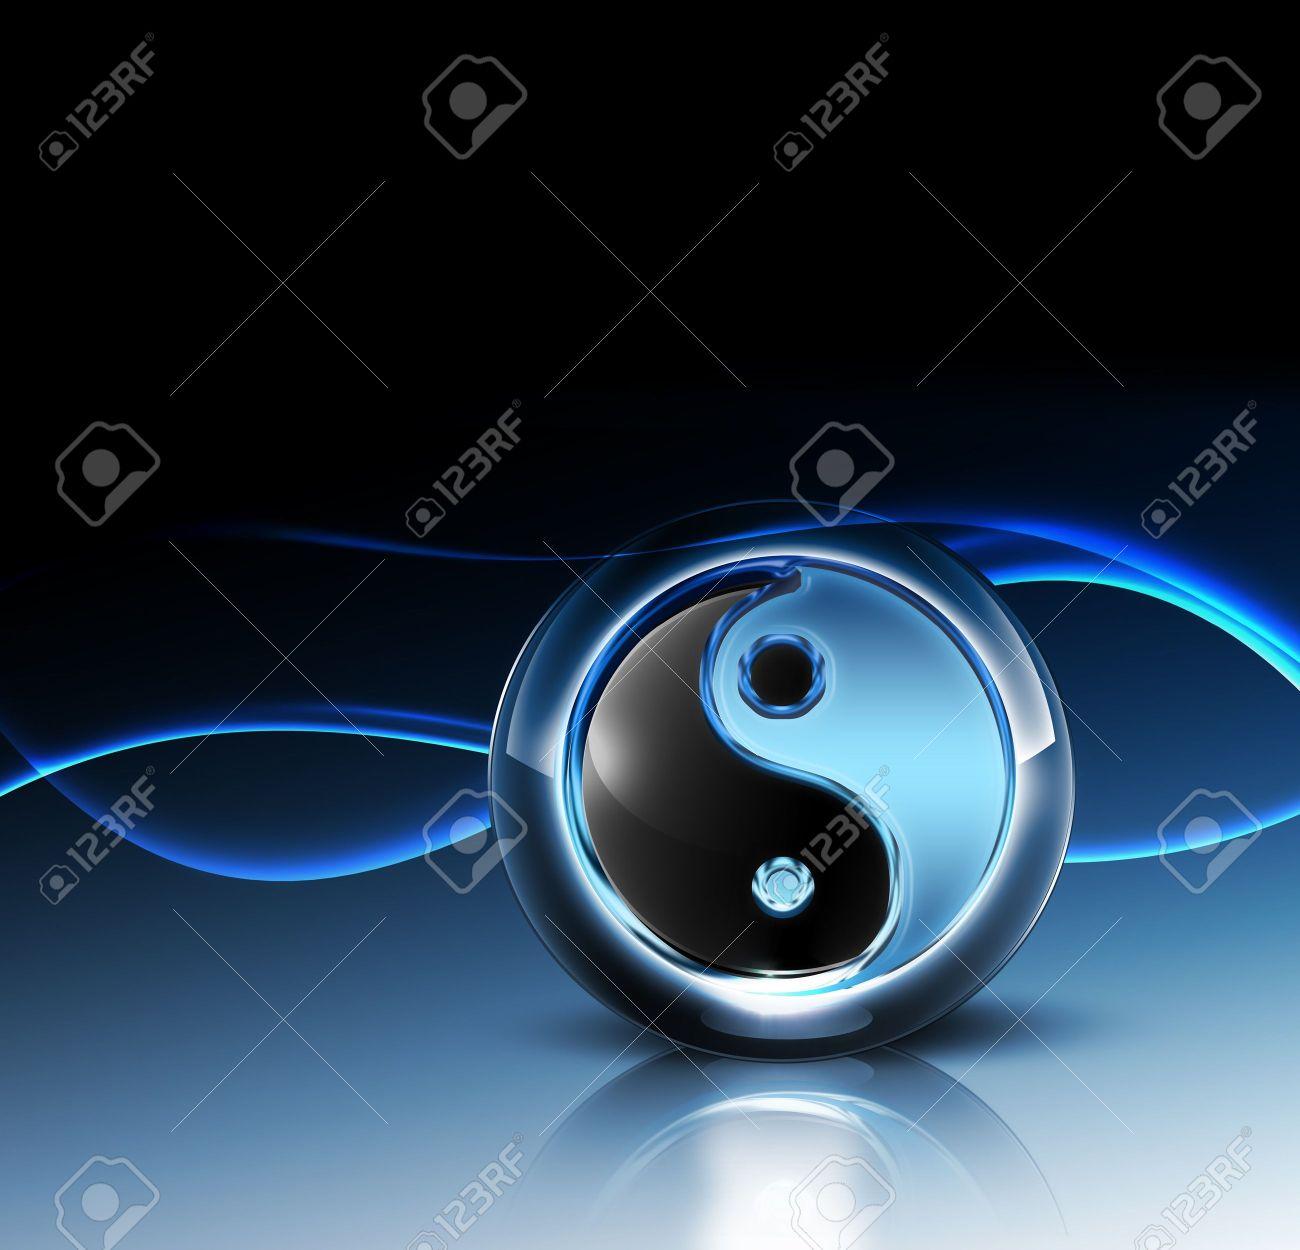 3d Yin Yang Symbol Fantastic Abstract Design Or Art Element